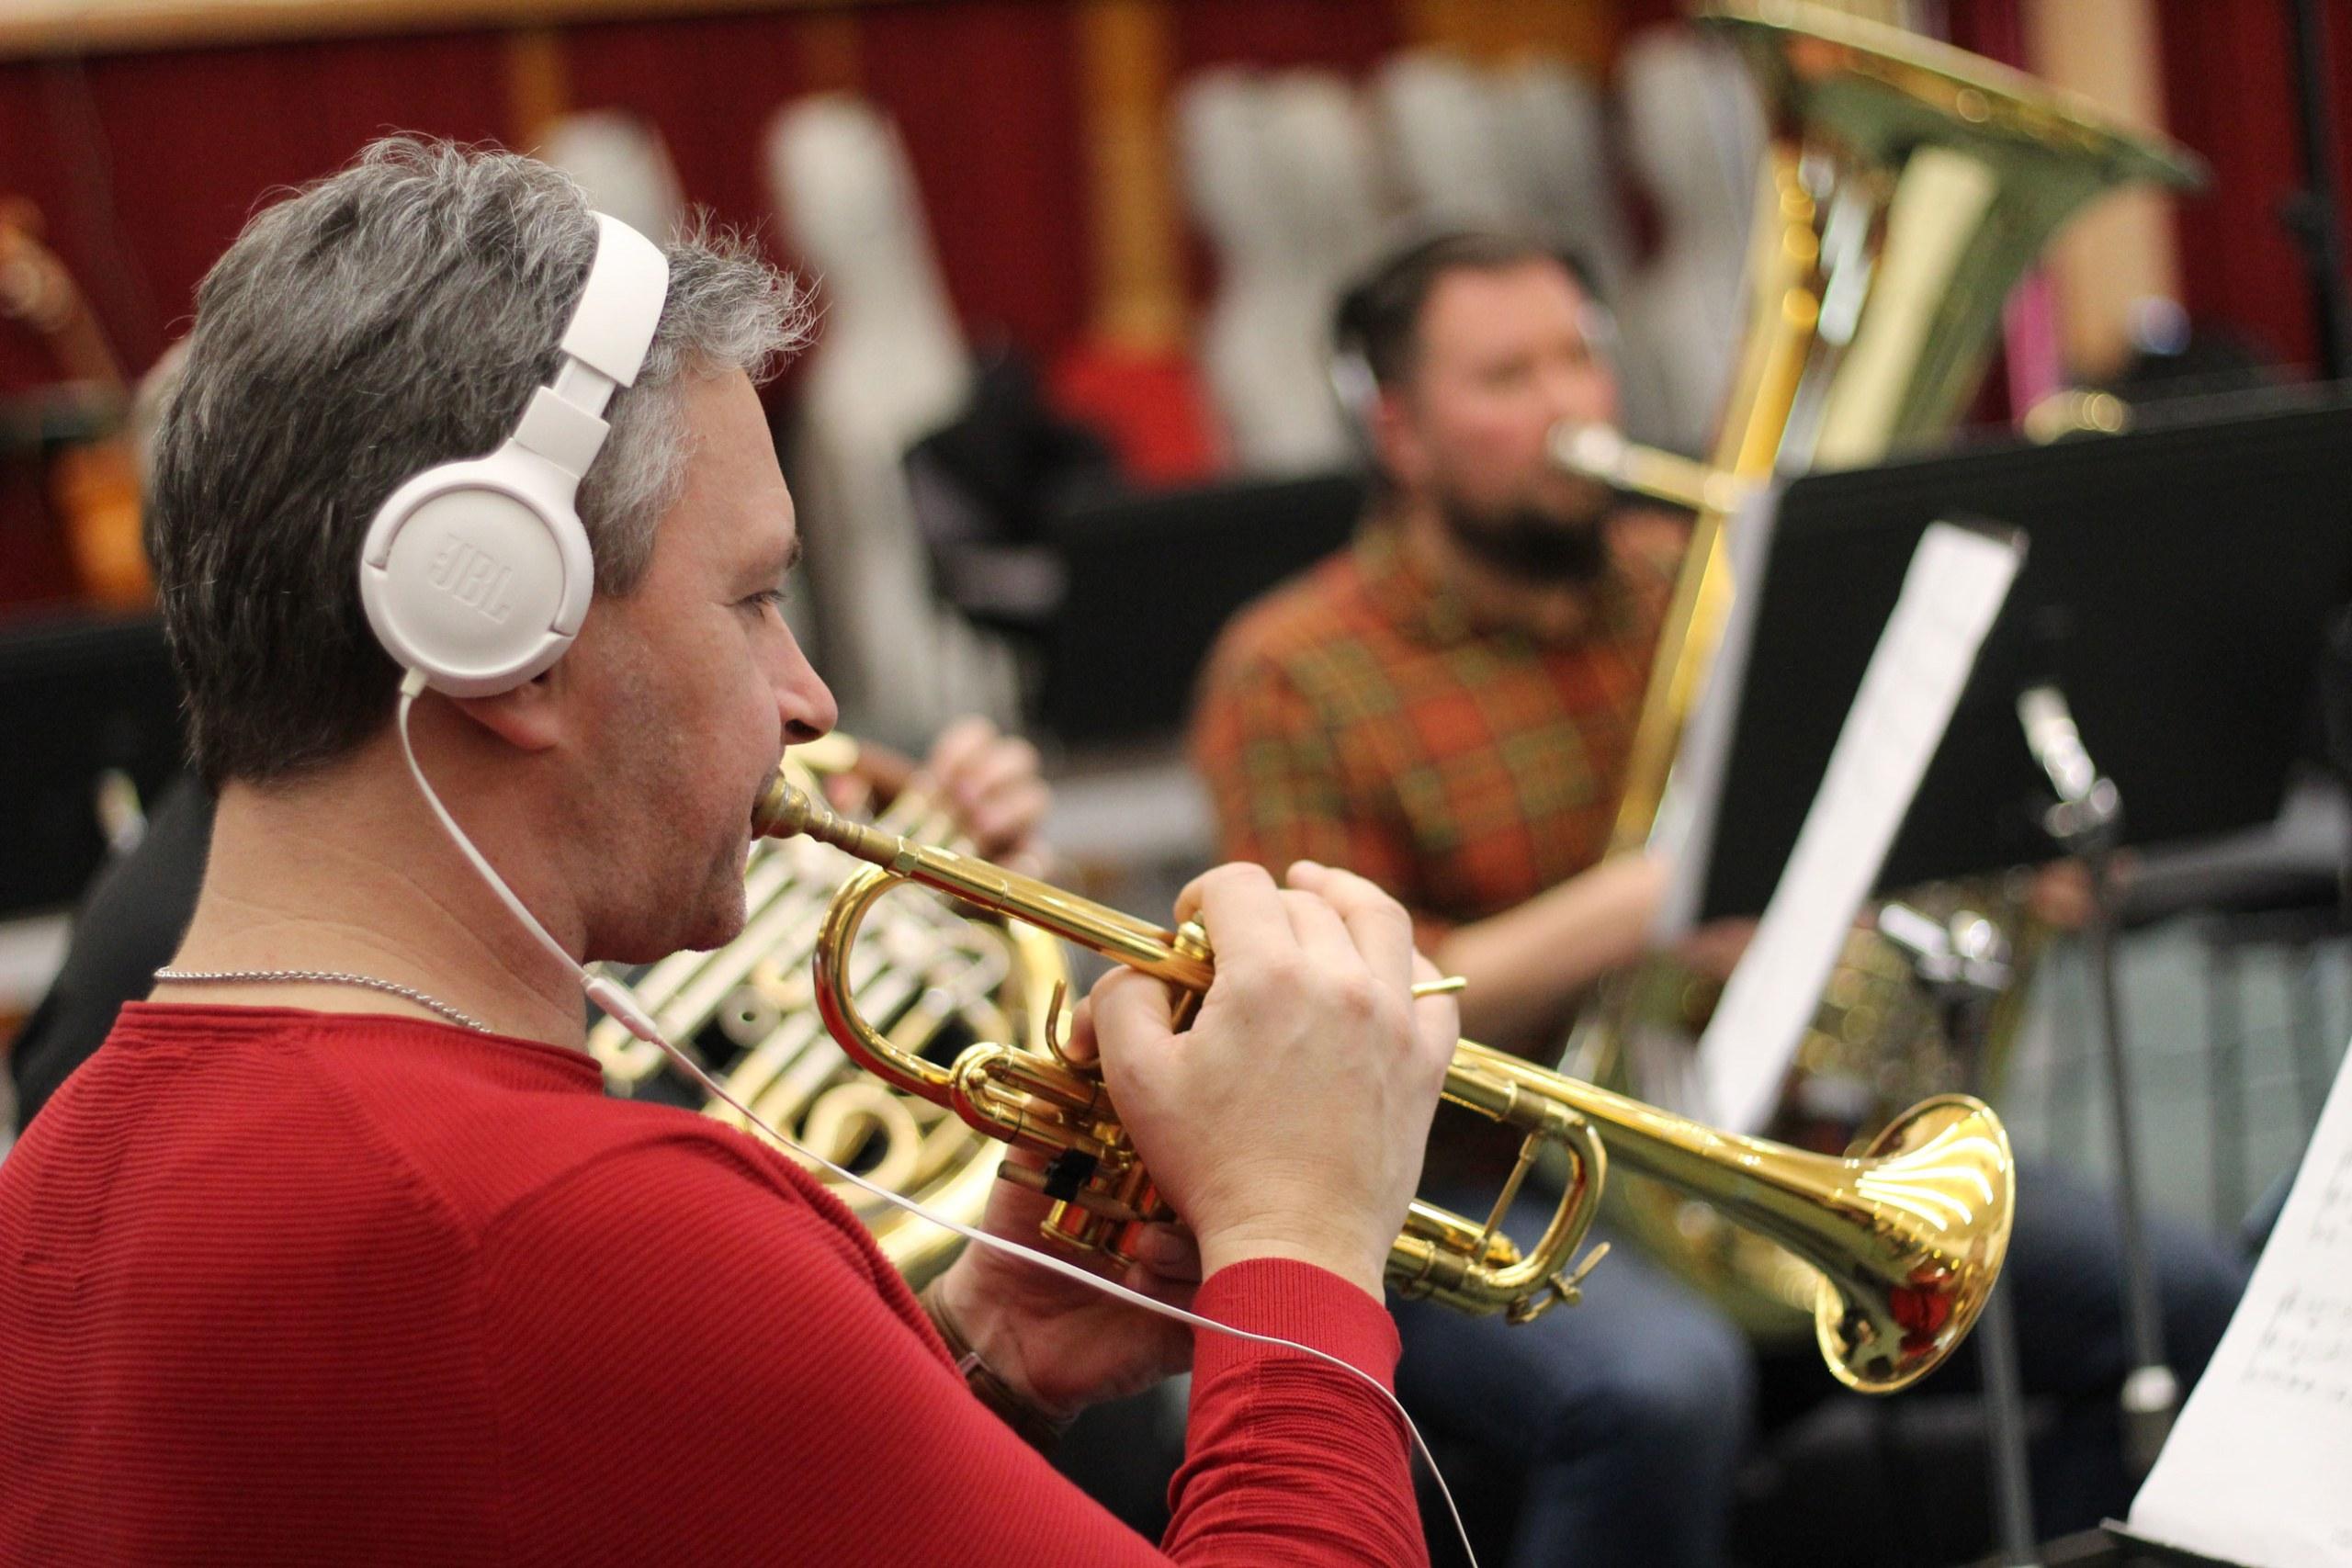 Trumpet player with headphones